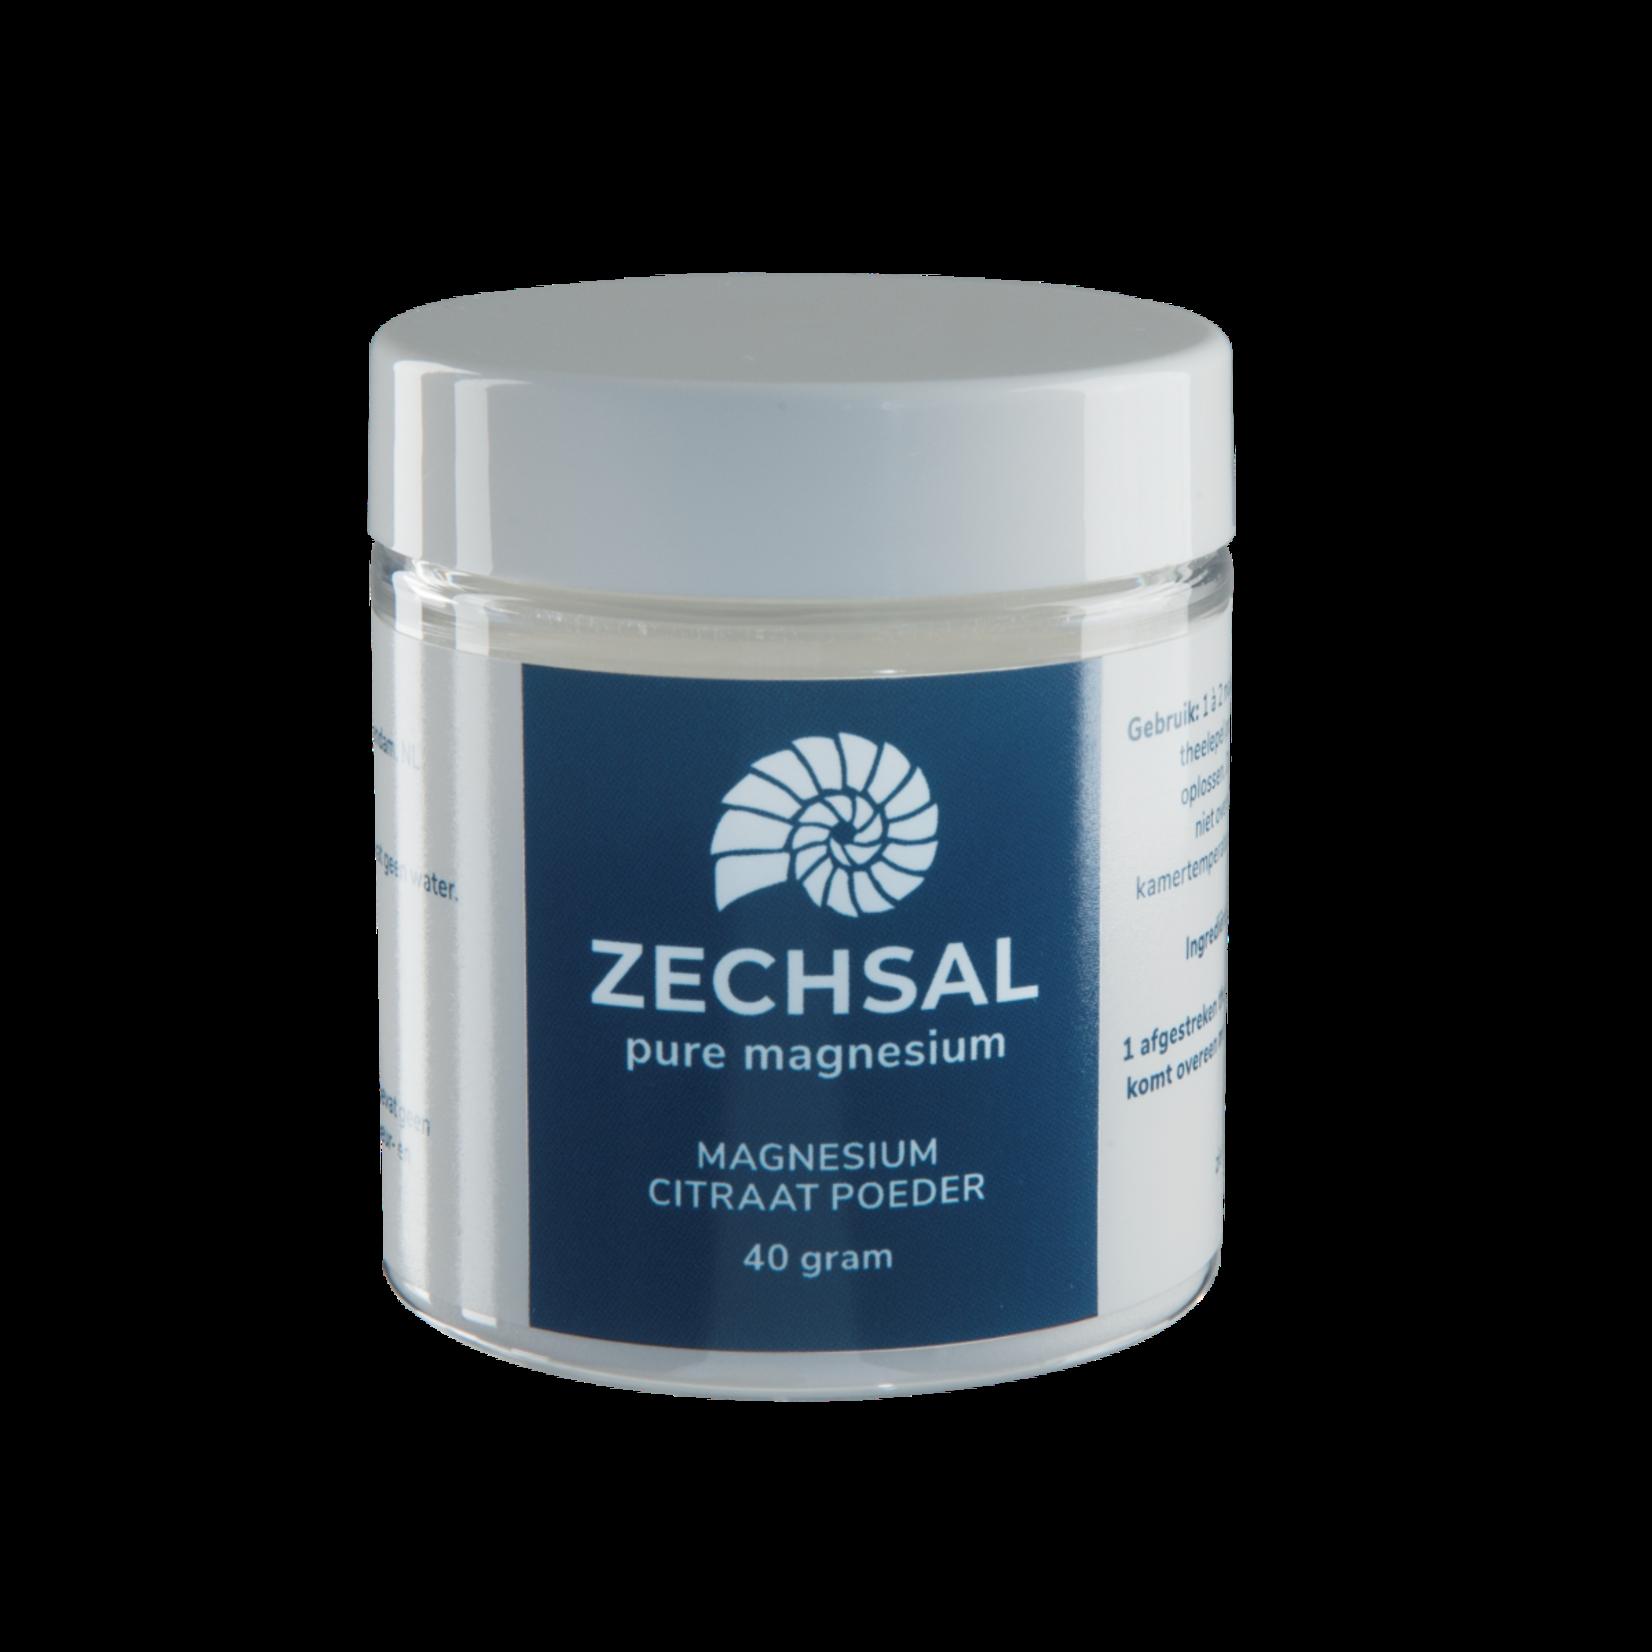 Zechsal Oraal magnesium Zechsal - magnesiumcitraat poeder MINI 40g